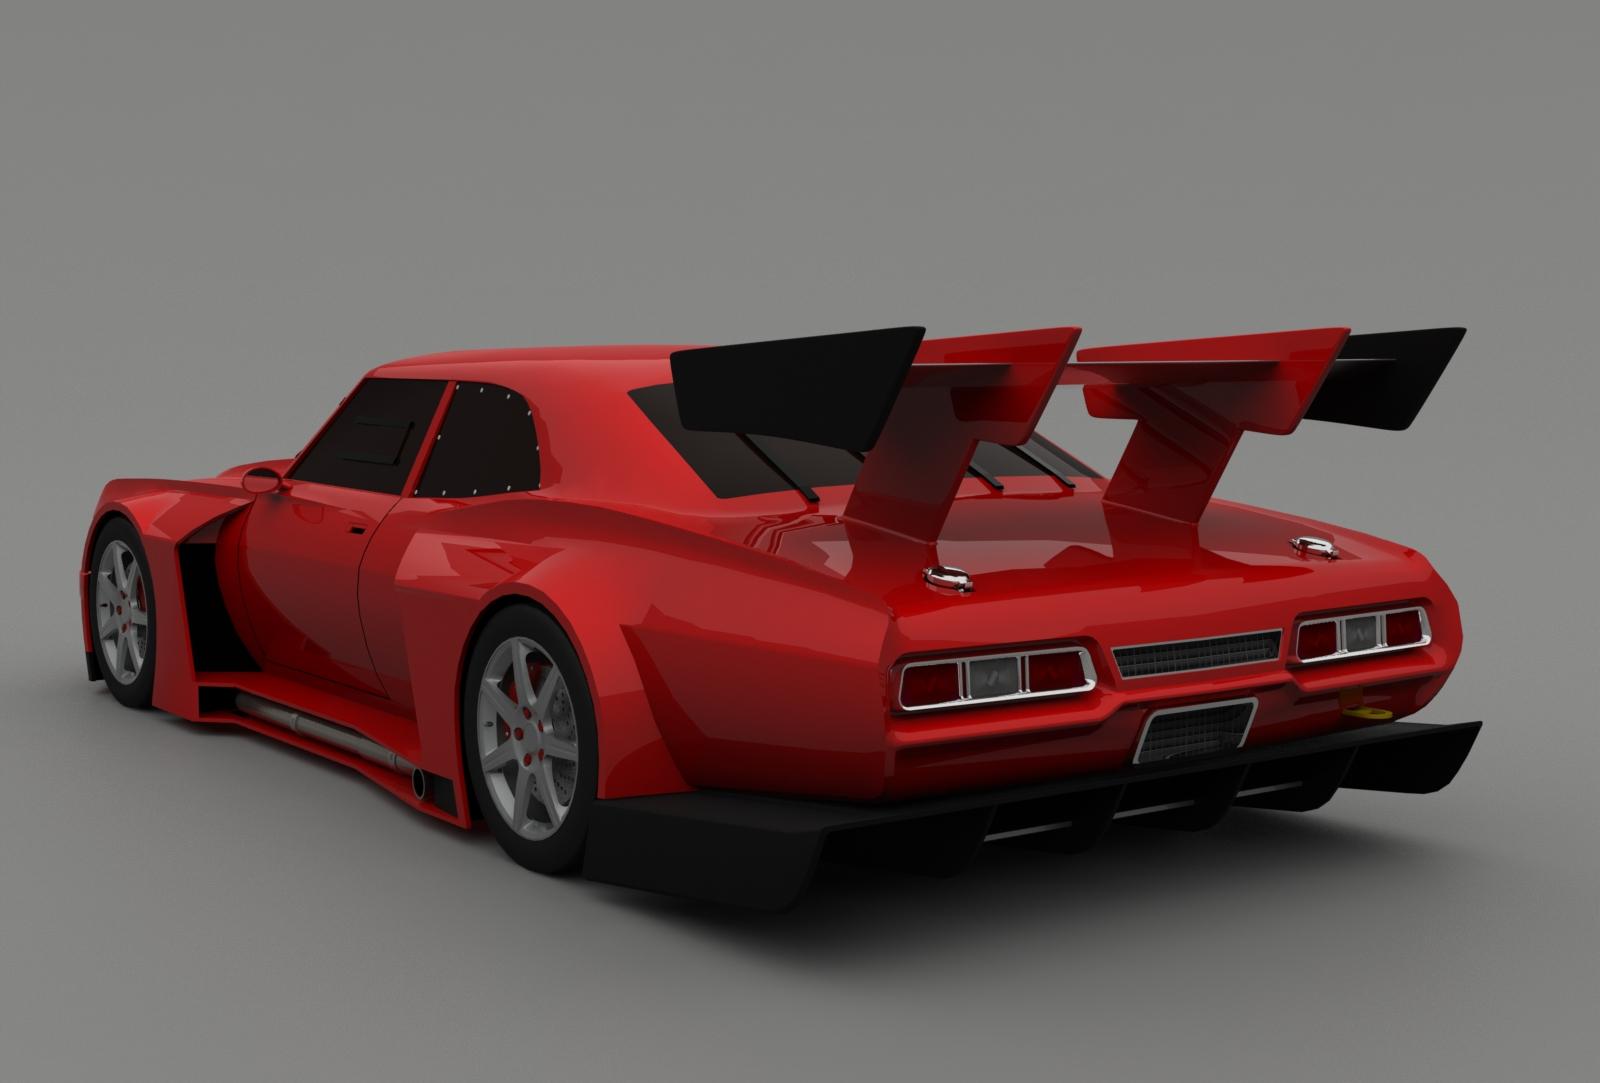 2013-03_The Crew_F.Beudin_Chevrolet Impala-1967-Racing2 Design_04